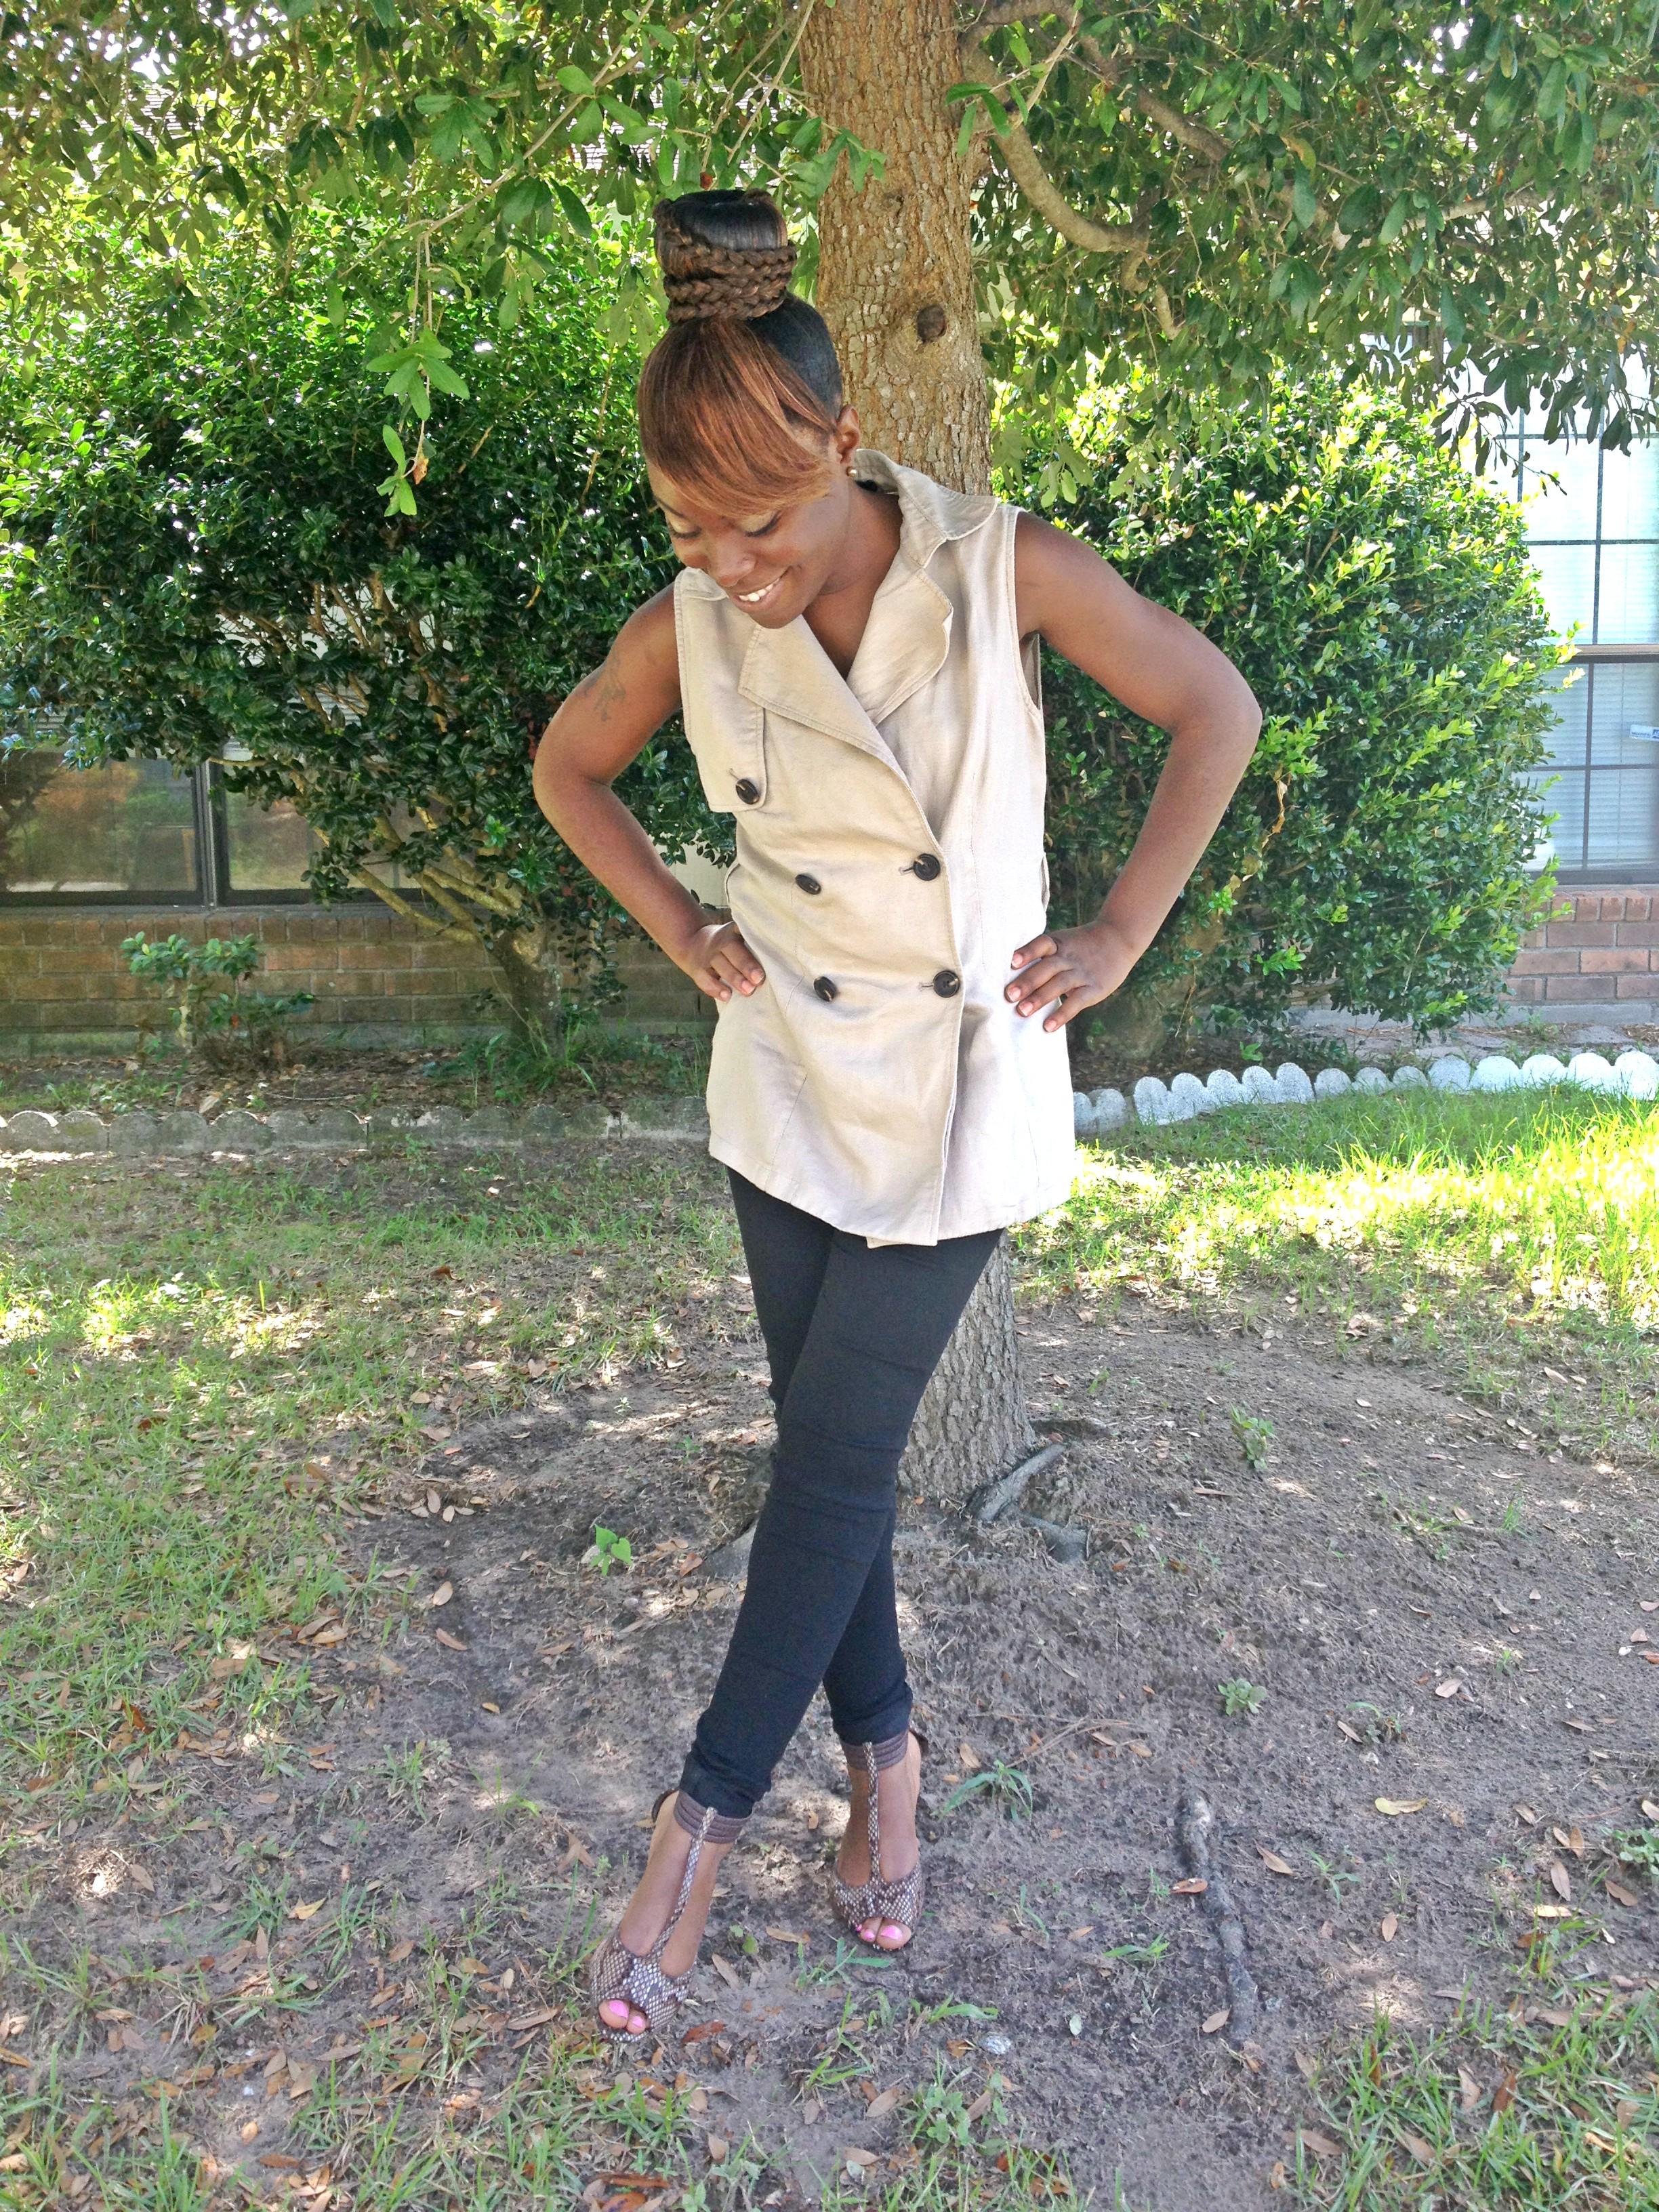 MY Pic Monday